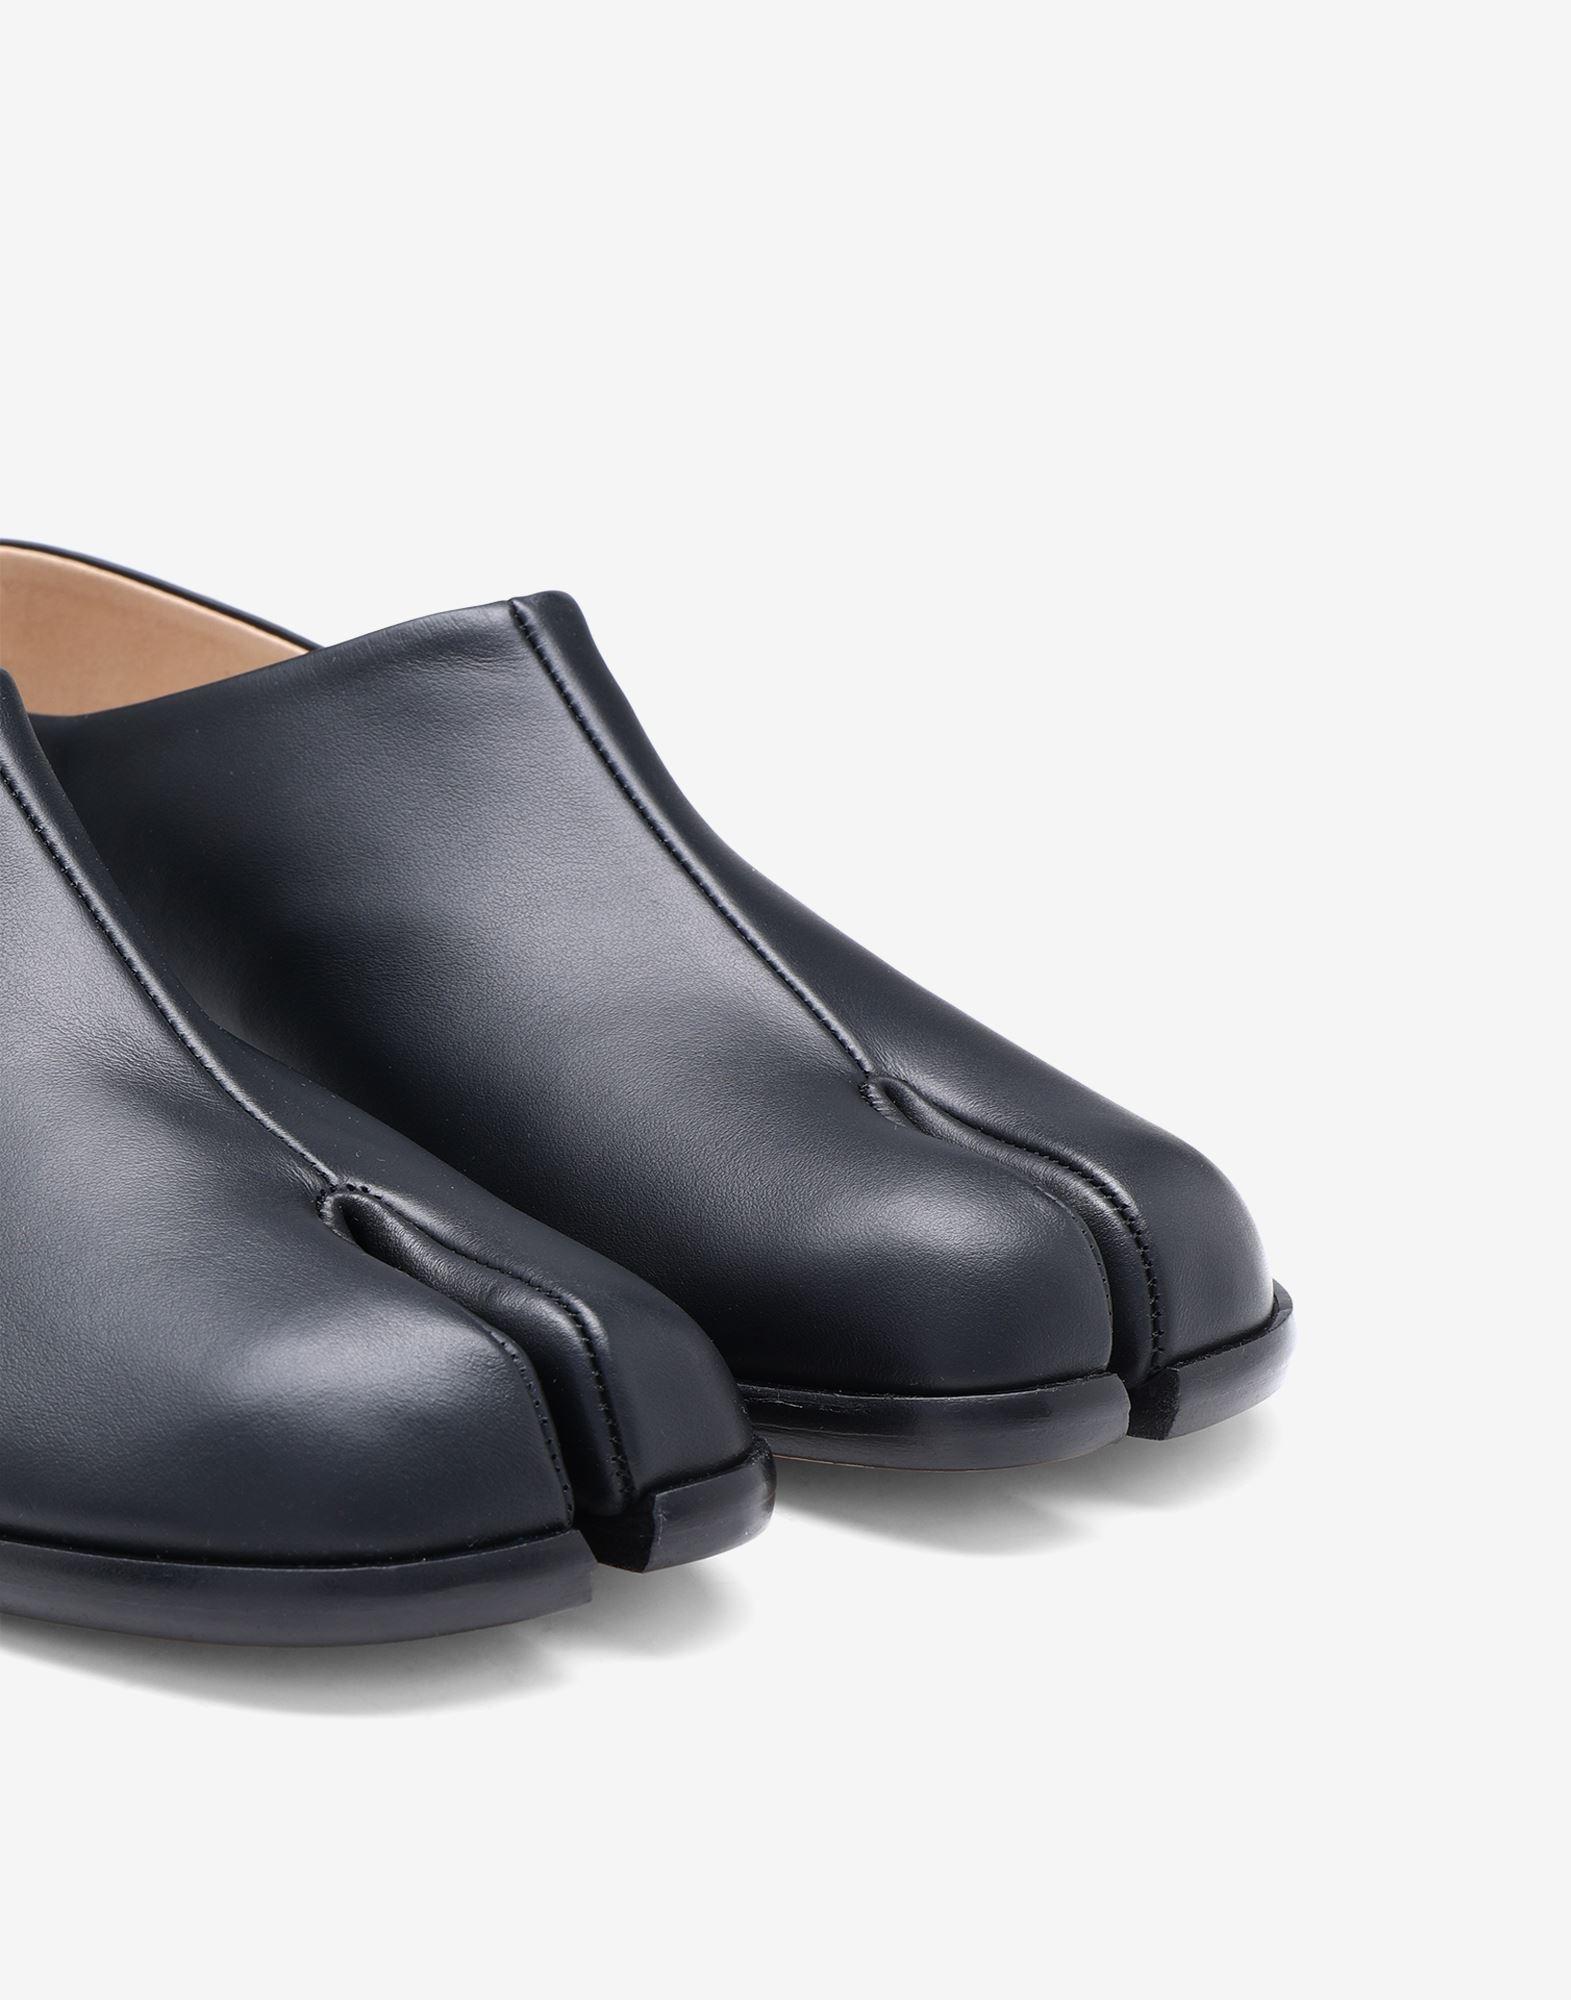 MAISON MARGIELA Chaussures à enfiler Tabi en cuir Mocassins Femme a